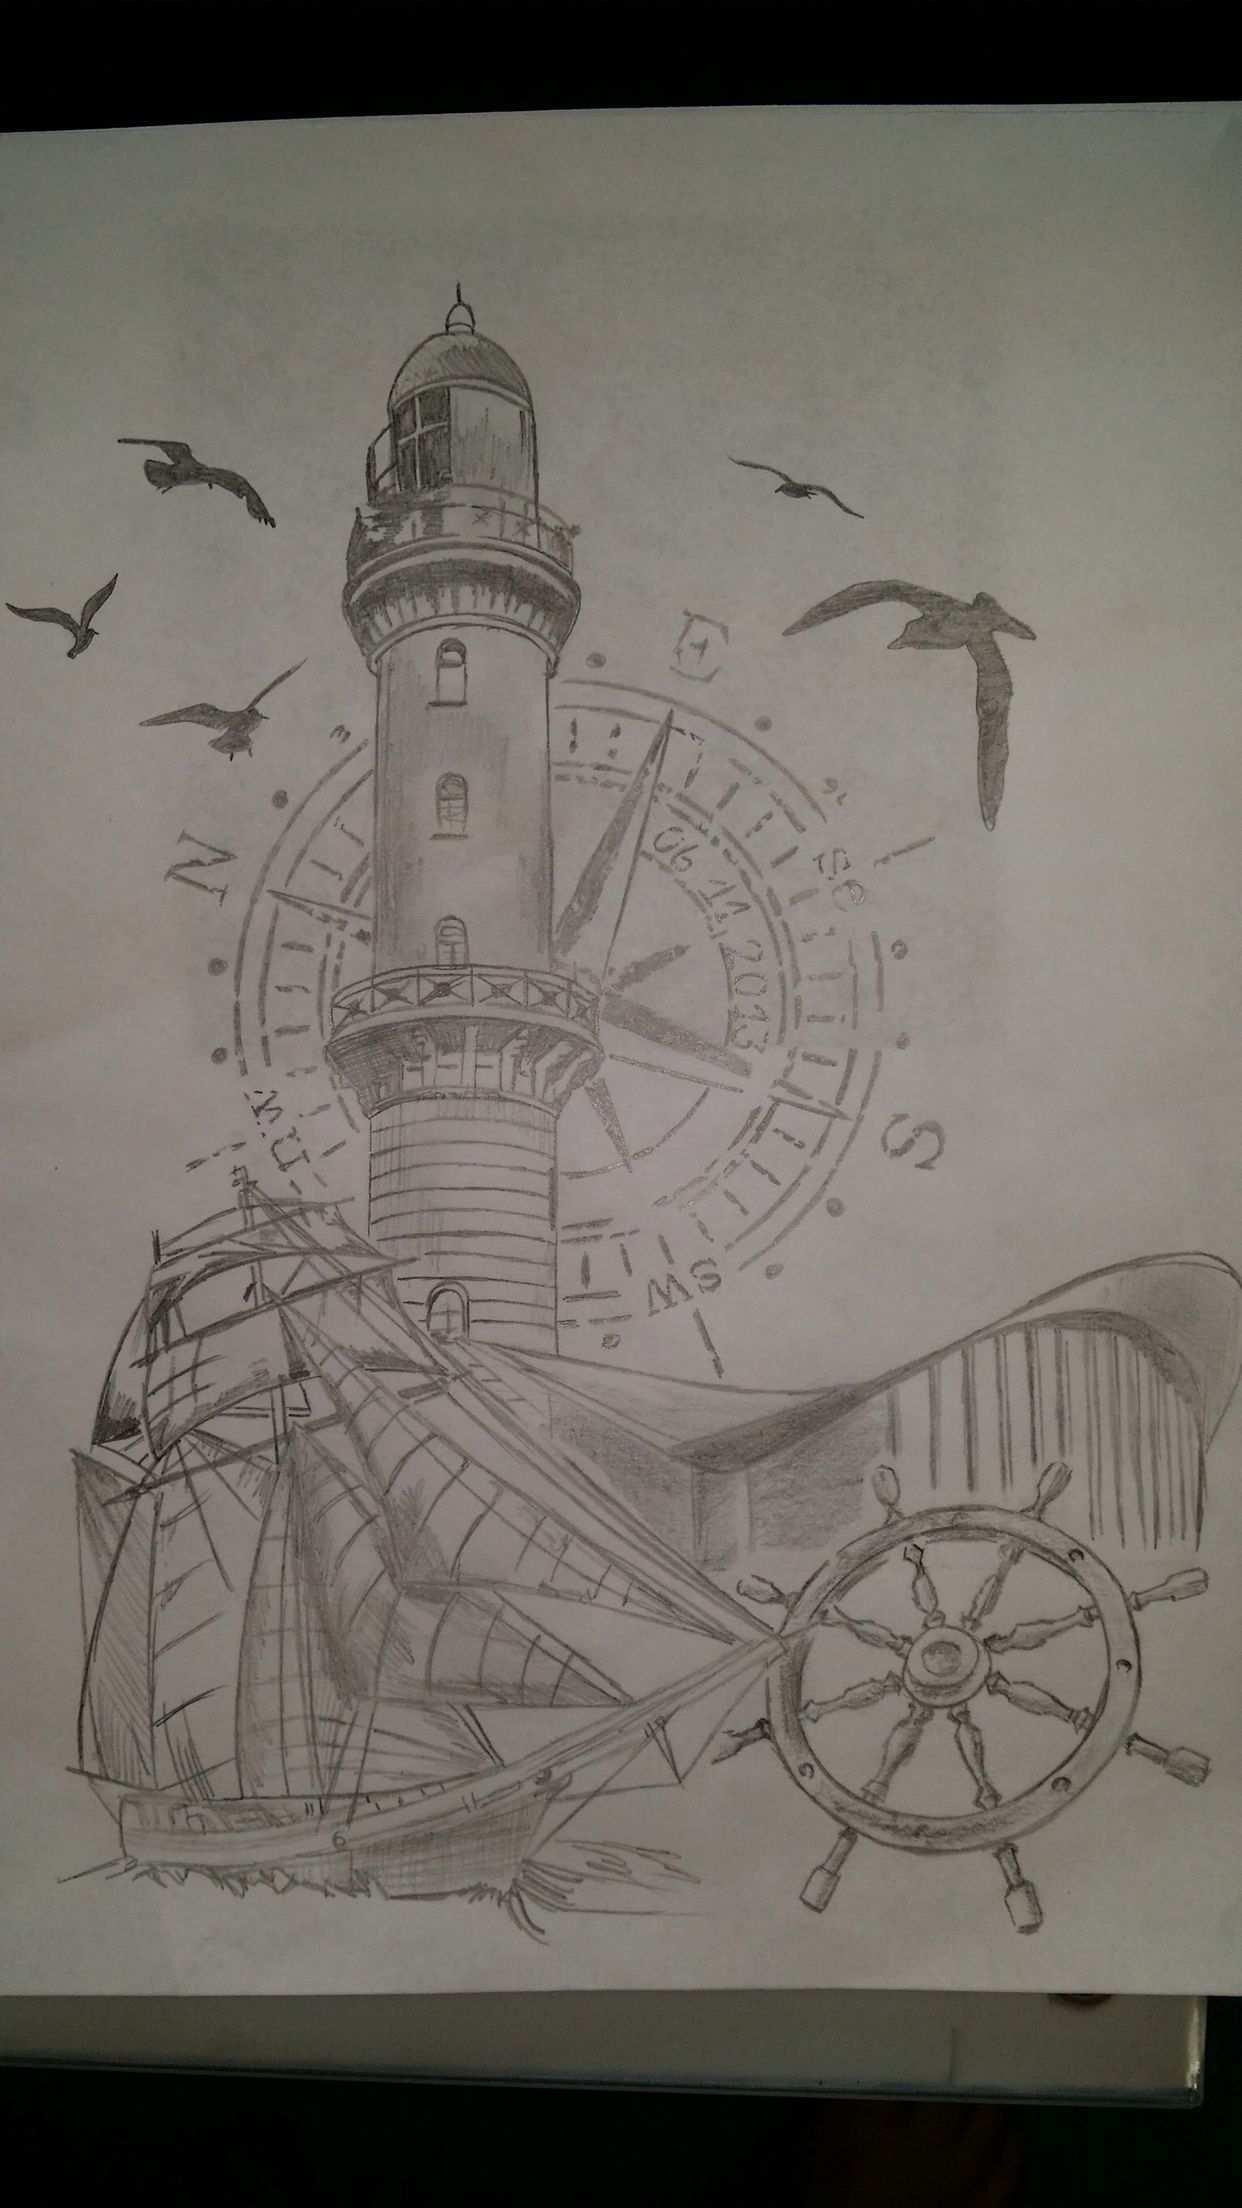 Leuchtturm Warnemunde Teepott Leuchtturm Warnemunde Leuchtturm Zeichnung Maritime Zeichnung